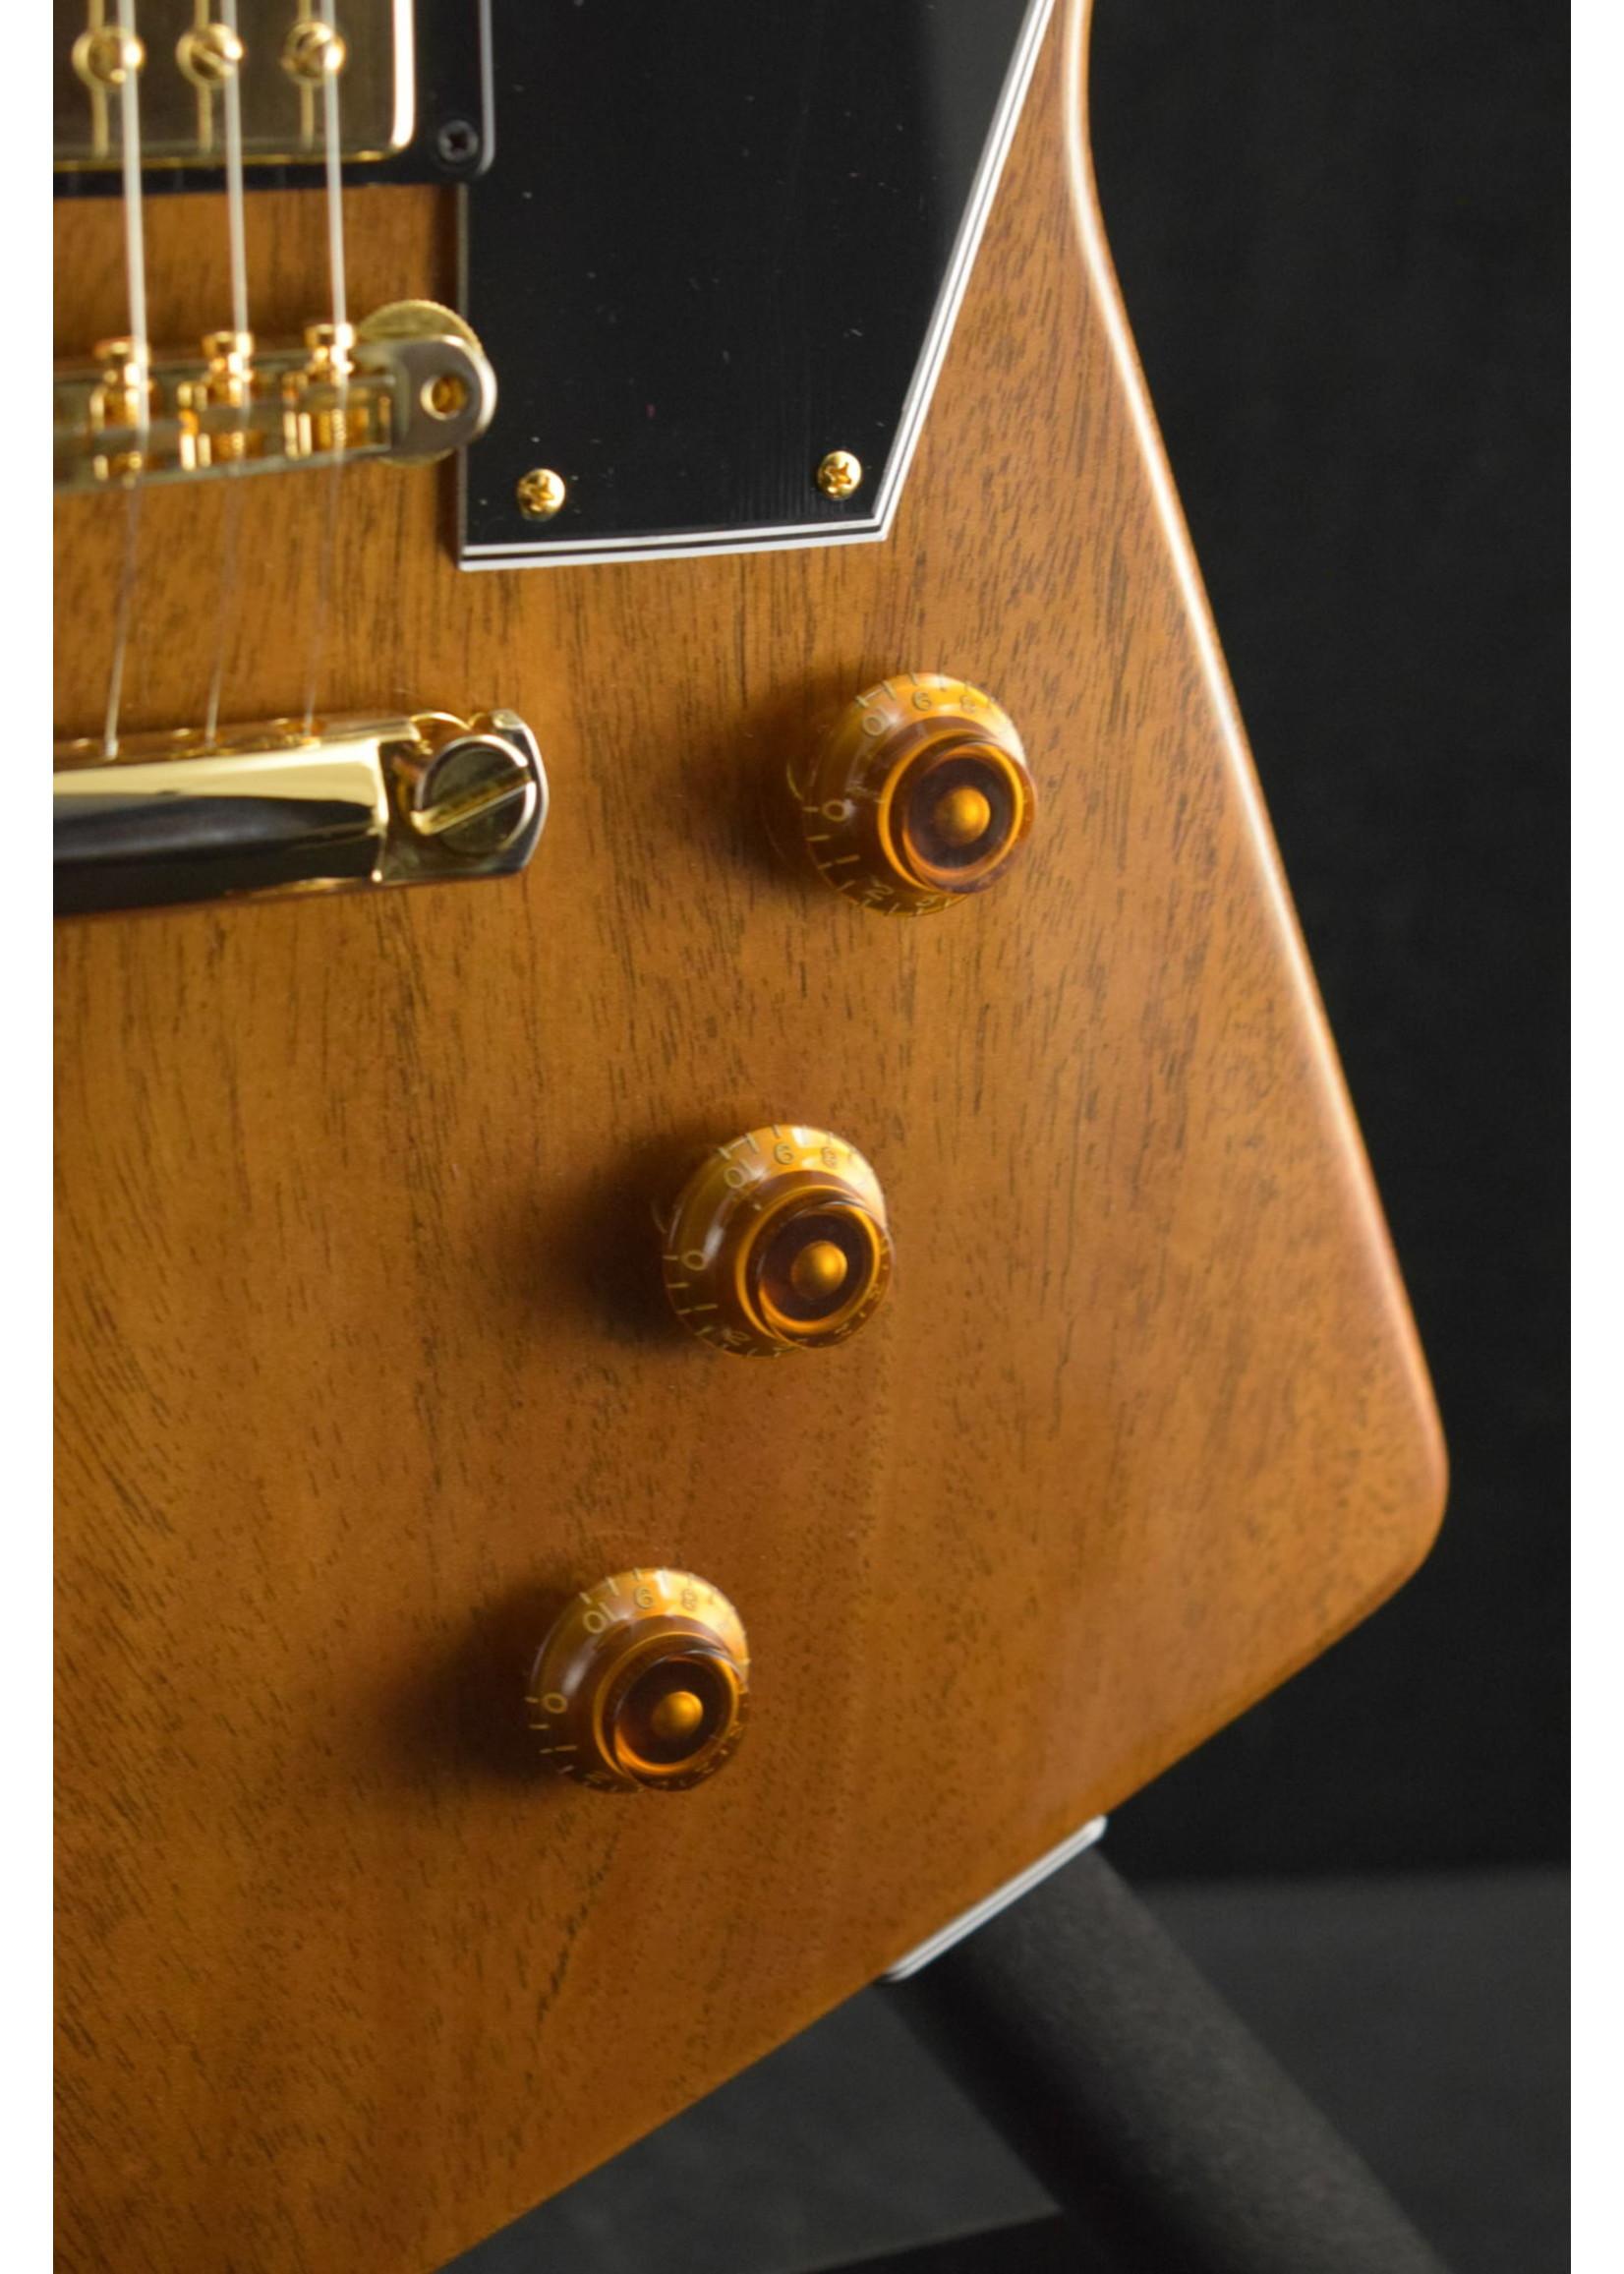 Gibson Gibson Custom 1958 Mahogany Explorer Reissue VOS - Walnut Finish